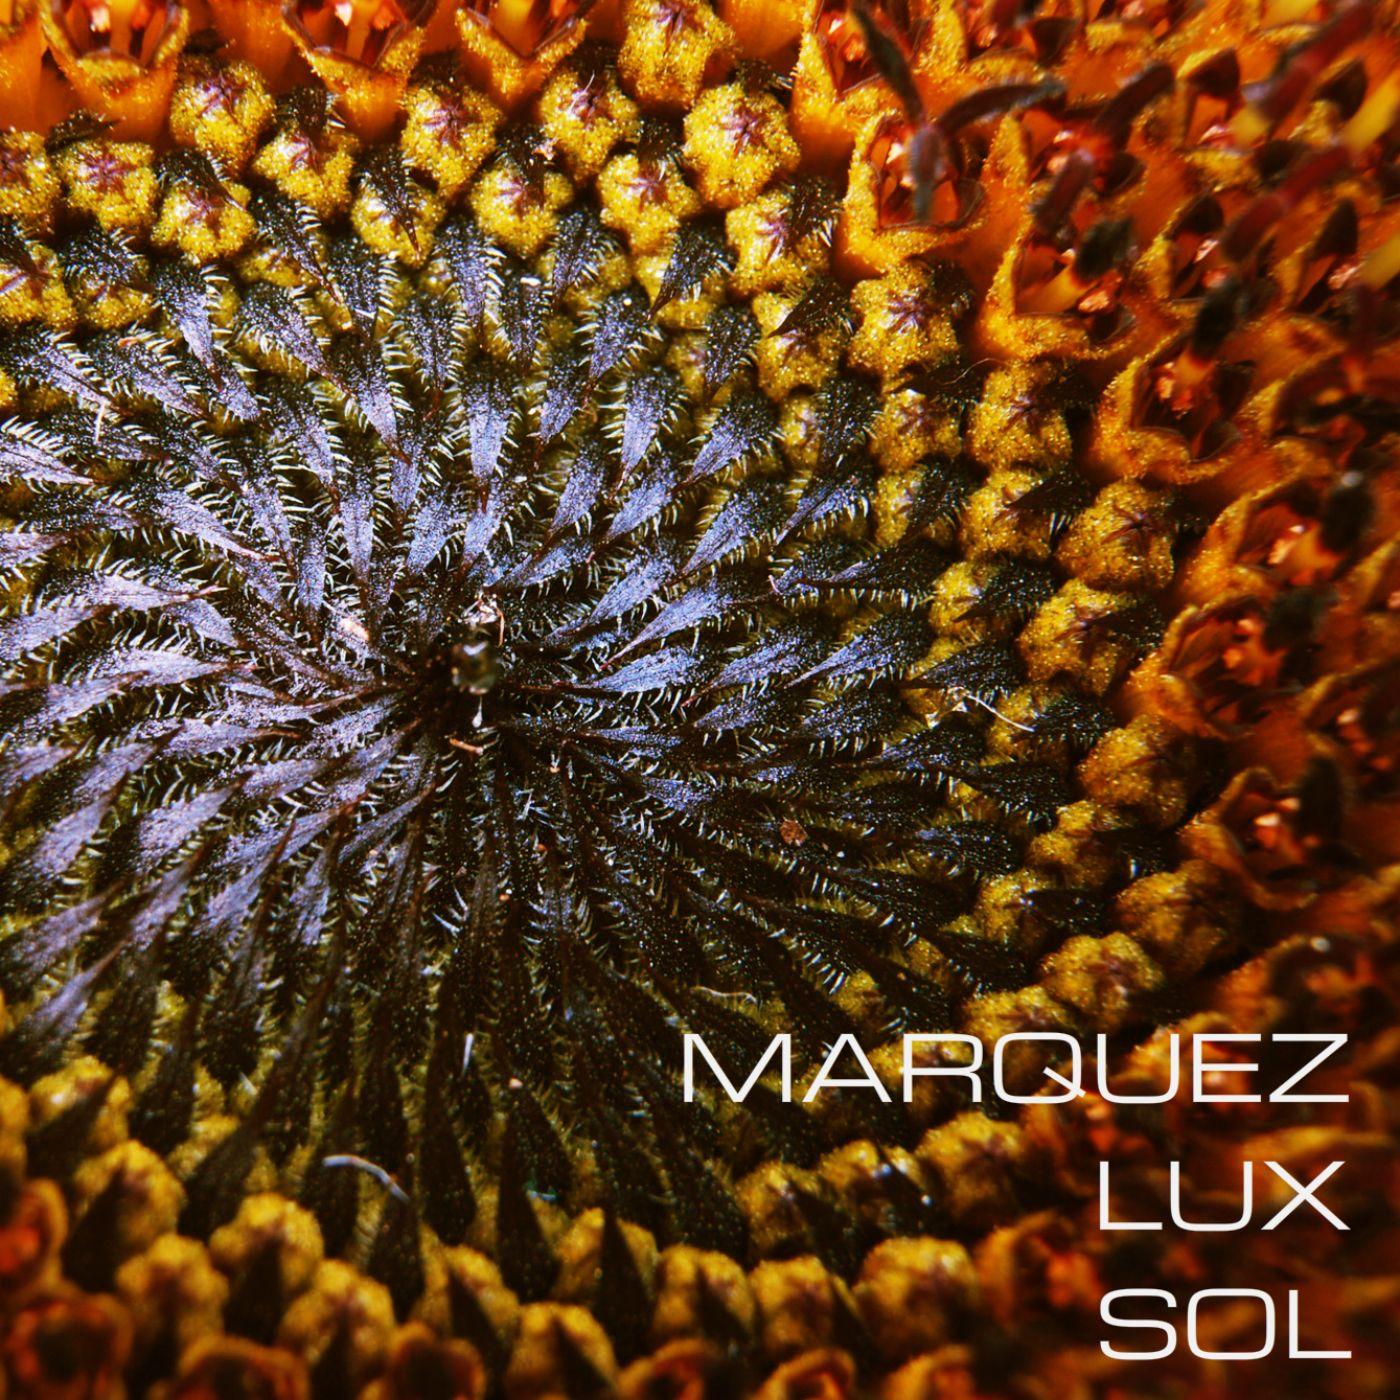 marquez lux sol original mix download added by. Black Bedroom Furniture Sets. Home Design Ideas